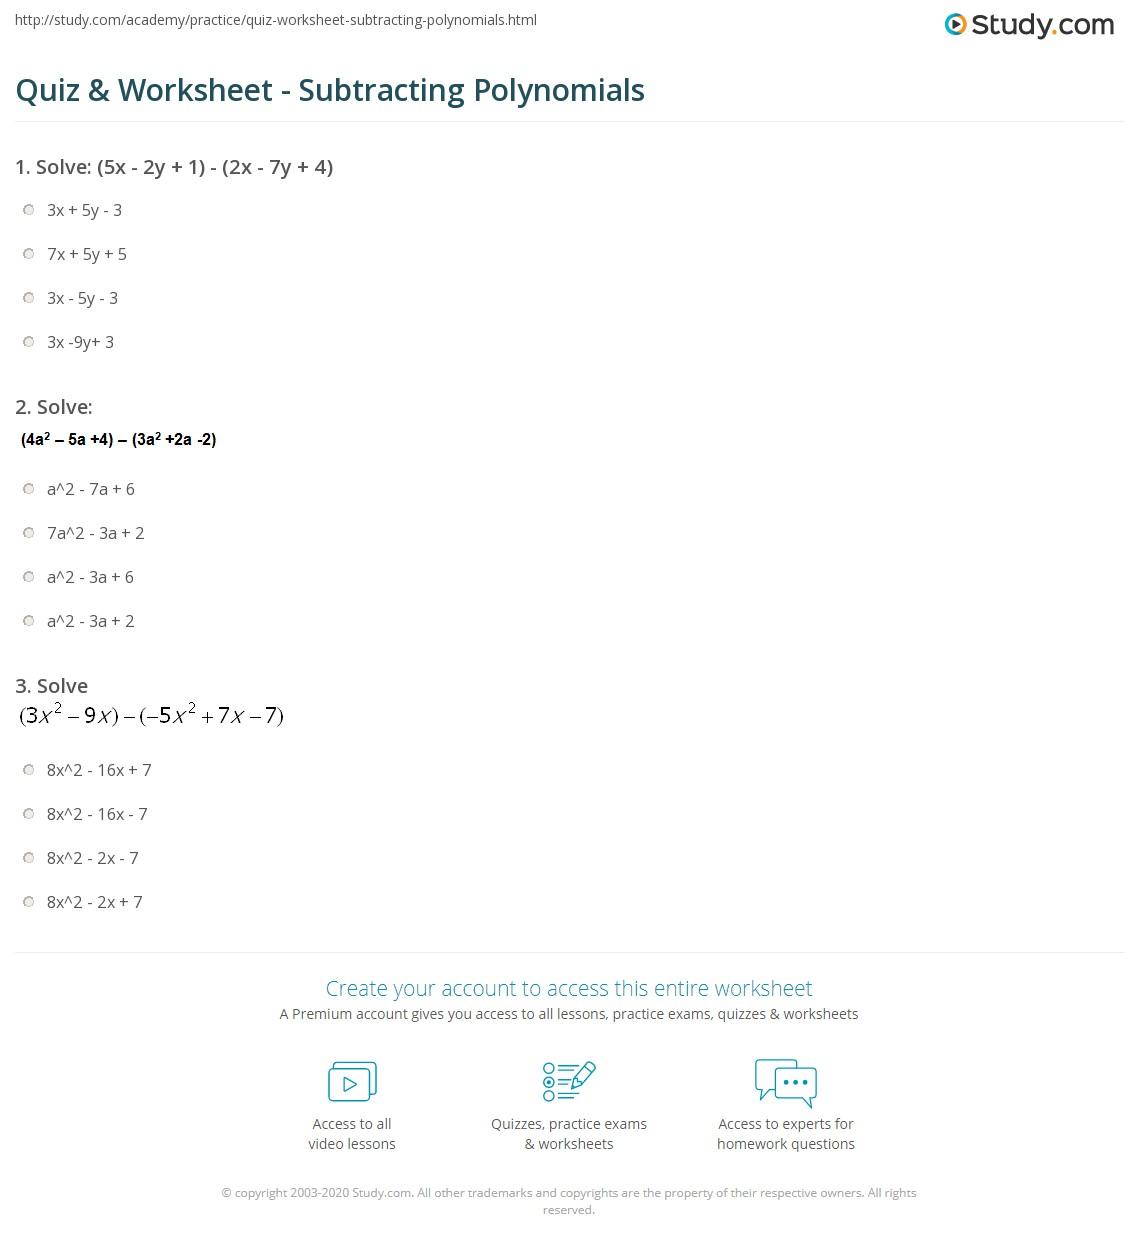 Worksheets Subtracting Polynomials Worksheet quiz worksheet subtracting polynomials study com print examples concept worksheet